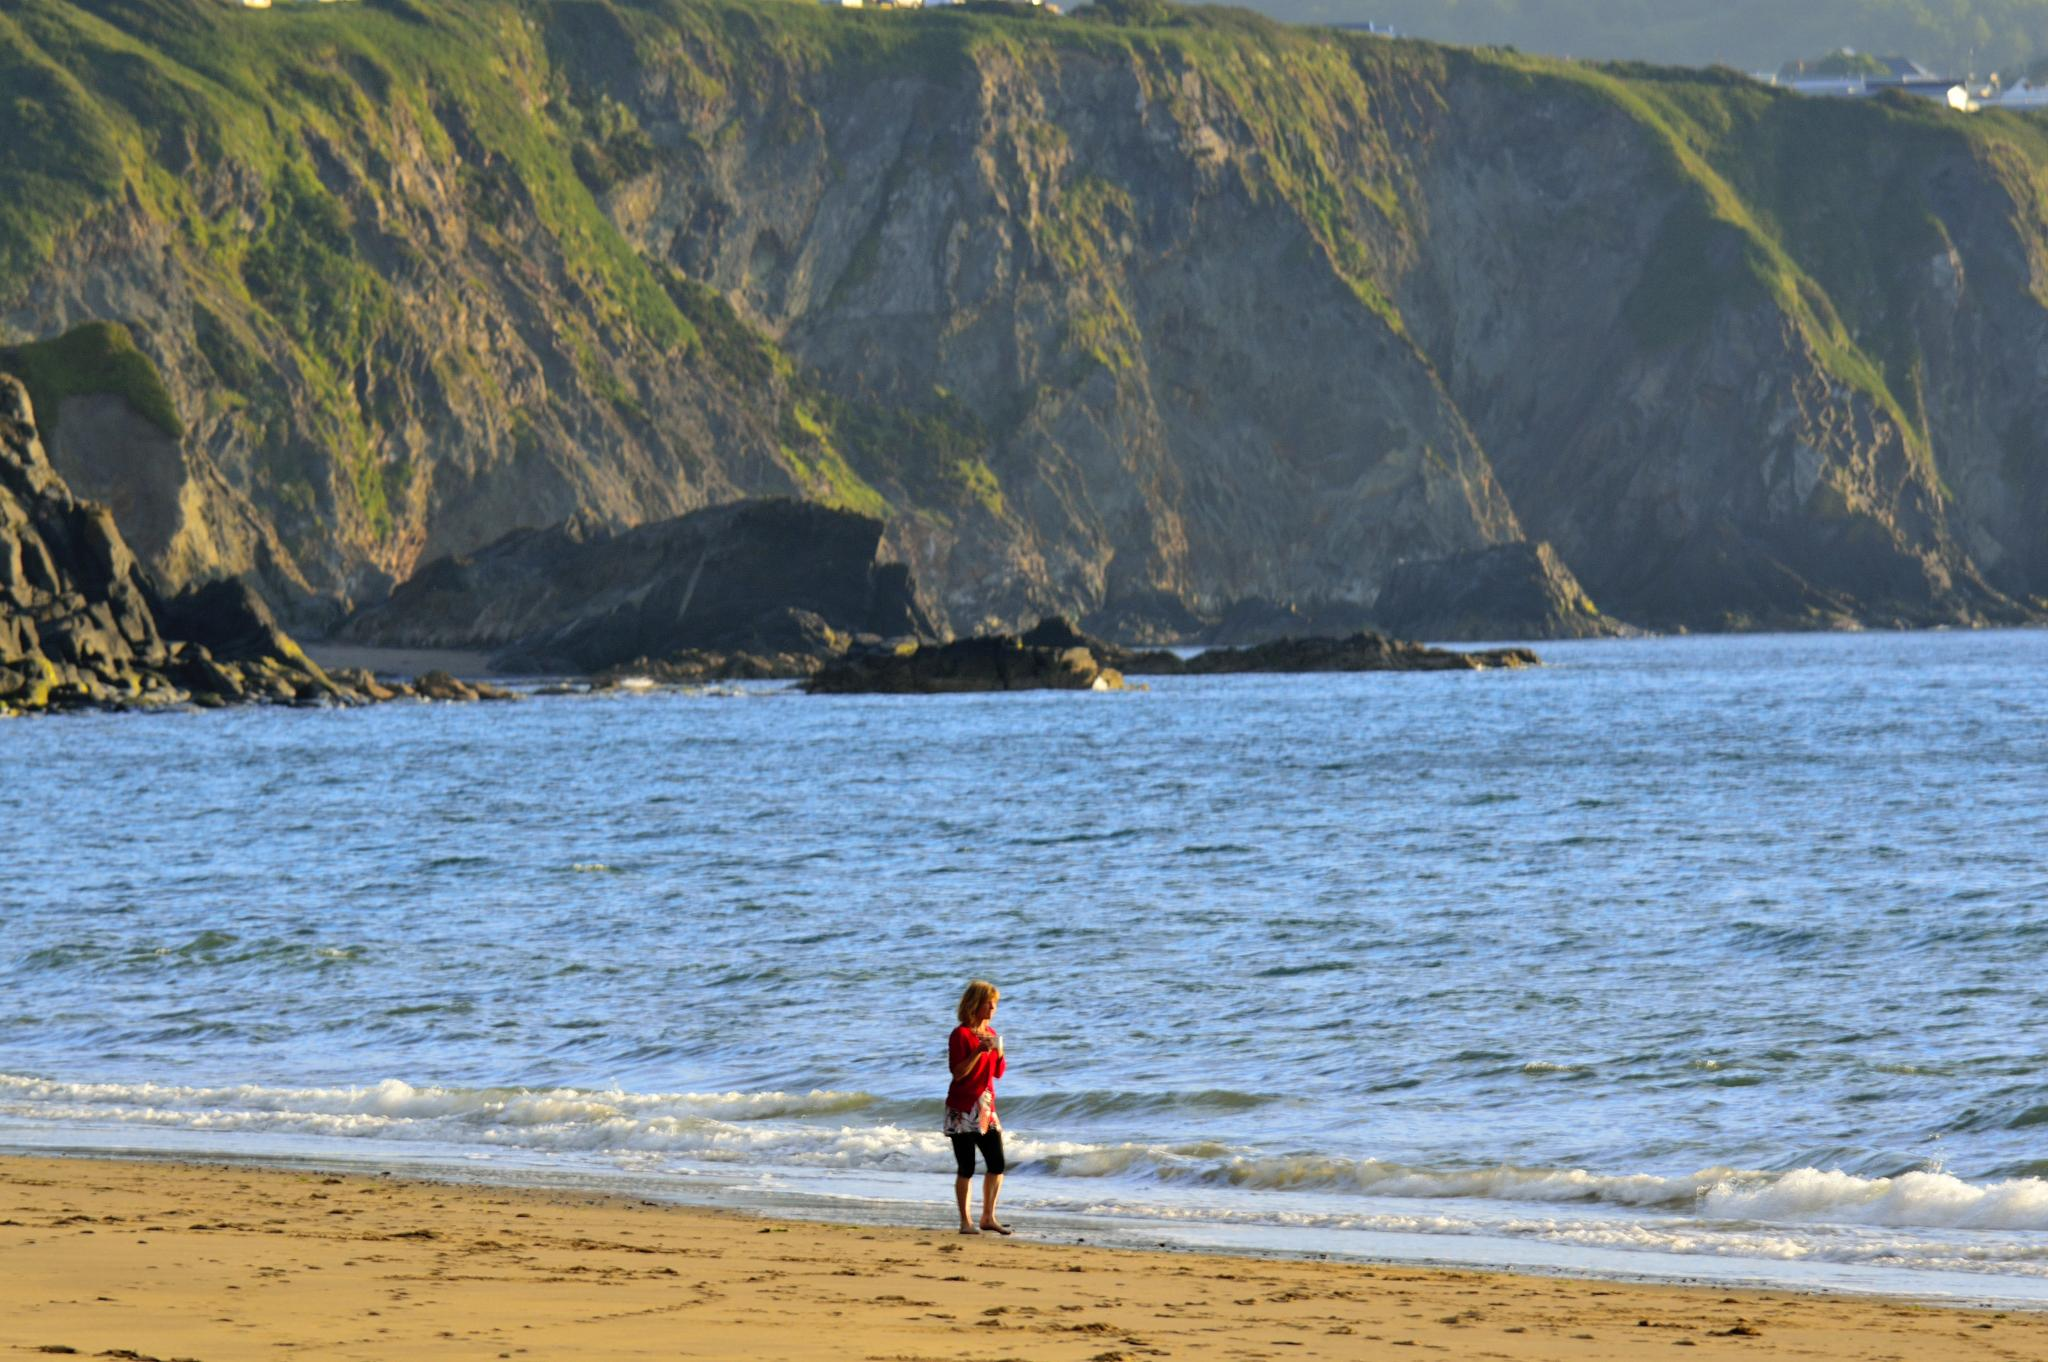 Penbryn Beach by dannie843evans